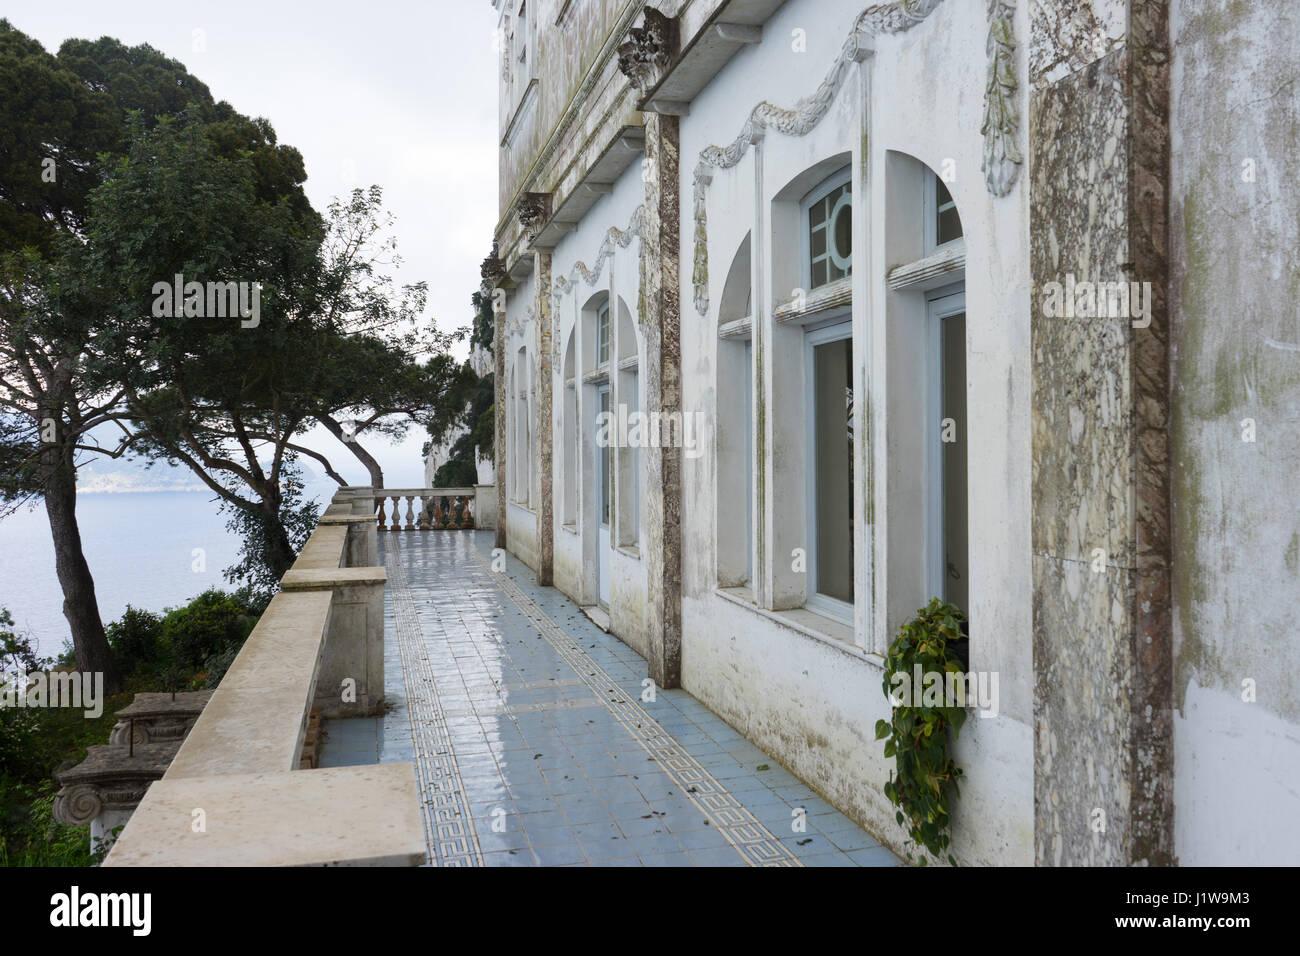 Villa jovis stock photos villa jovis stock images alamy for Capri villa